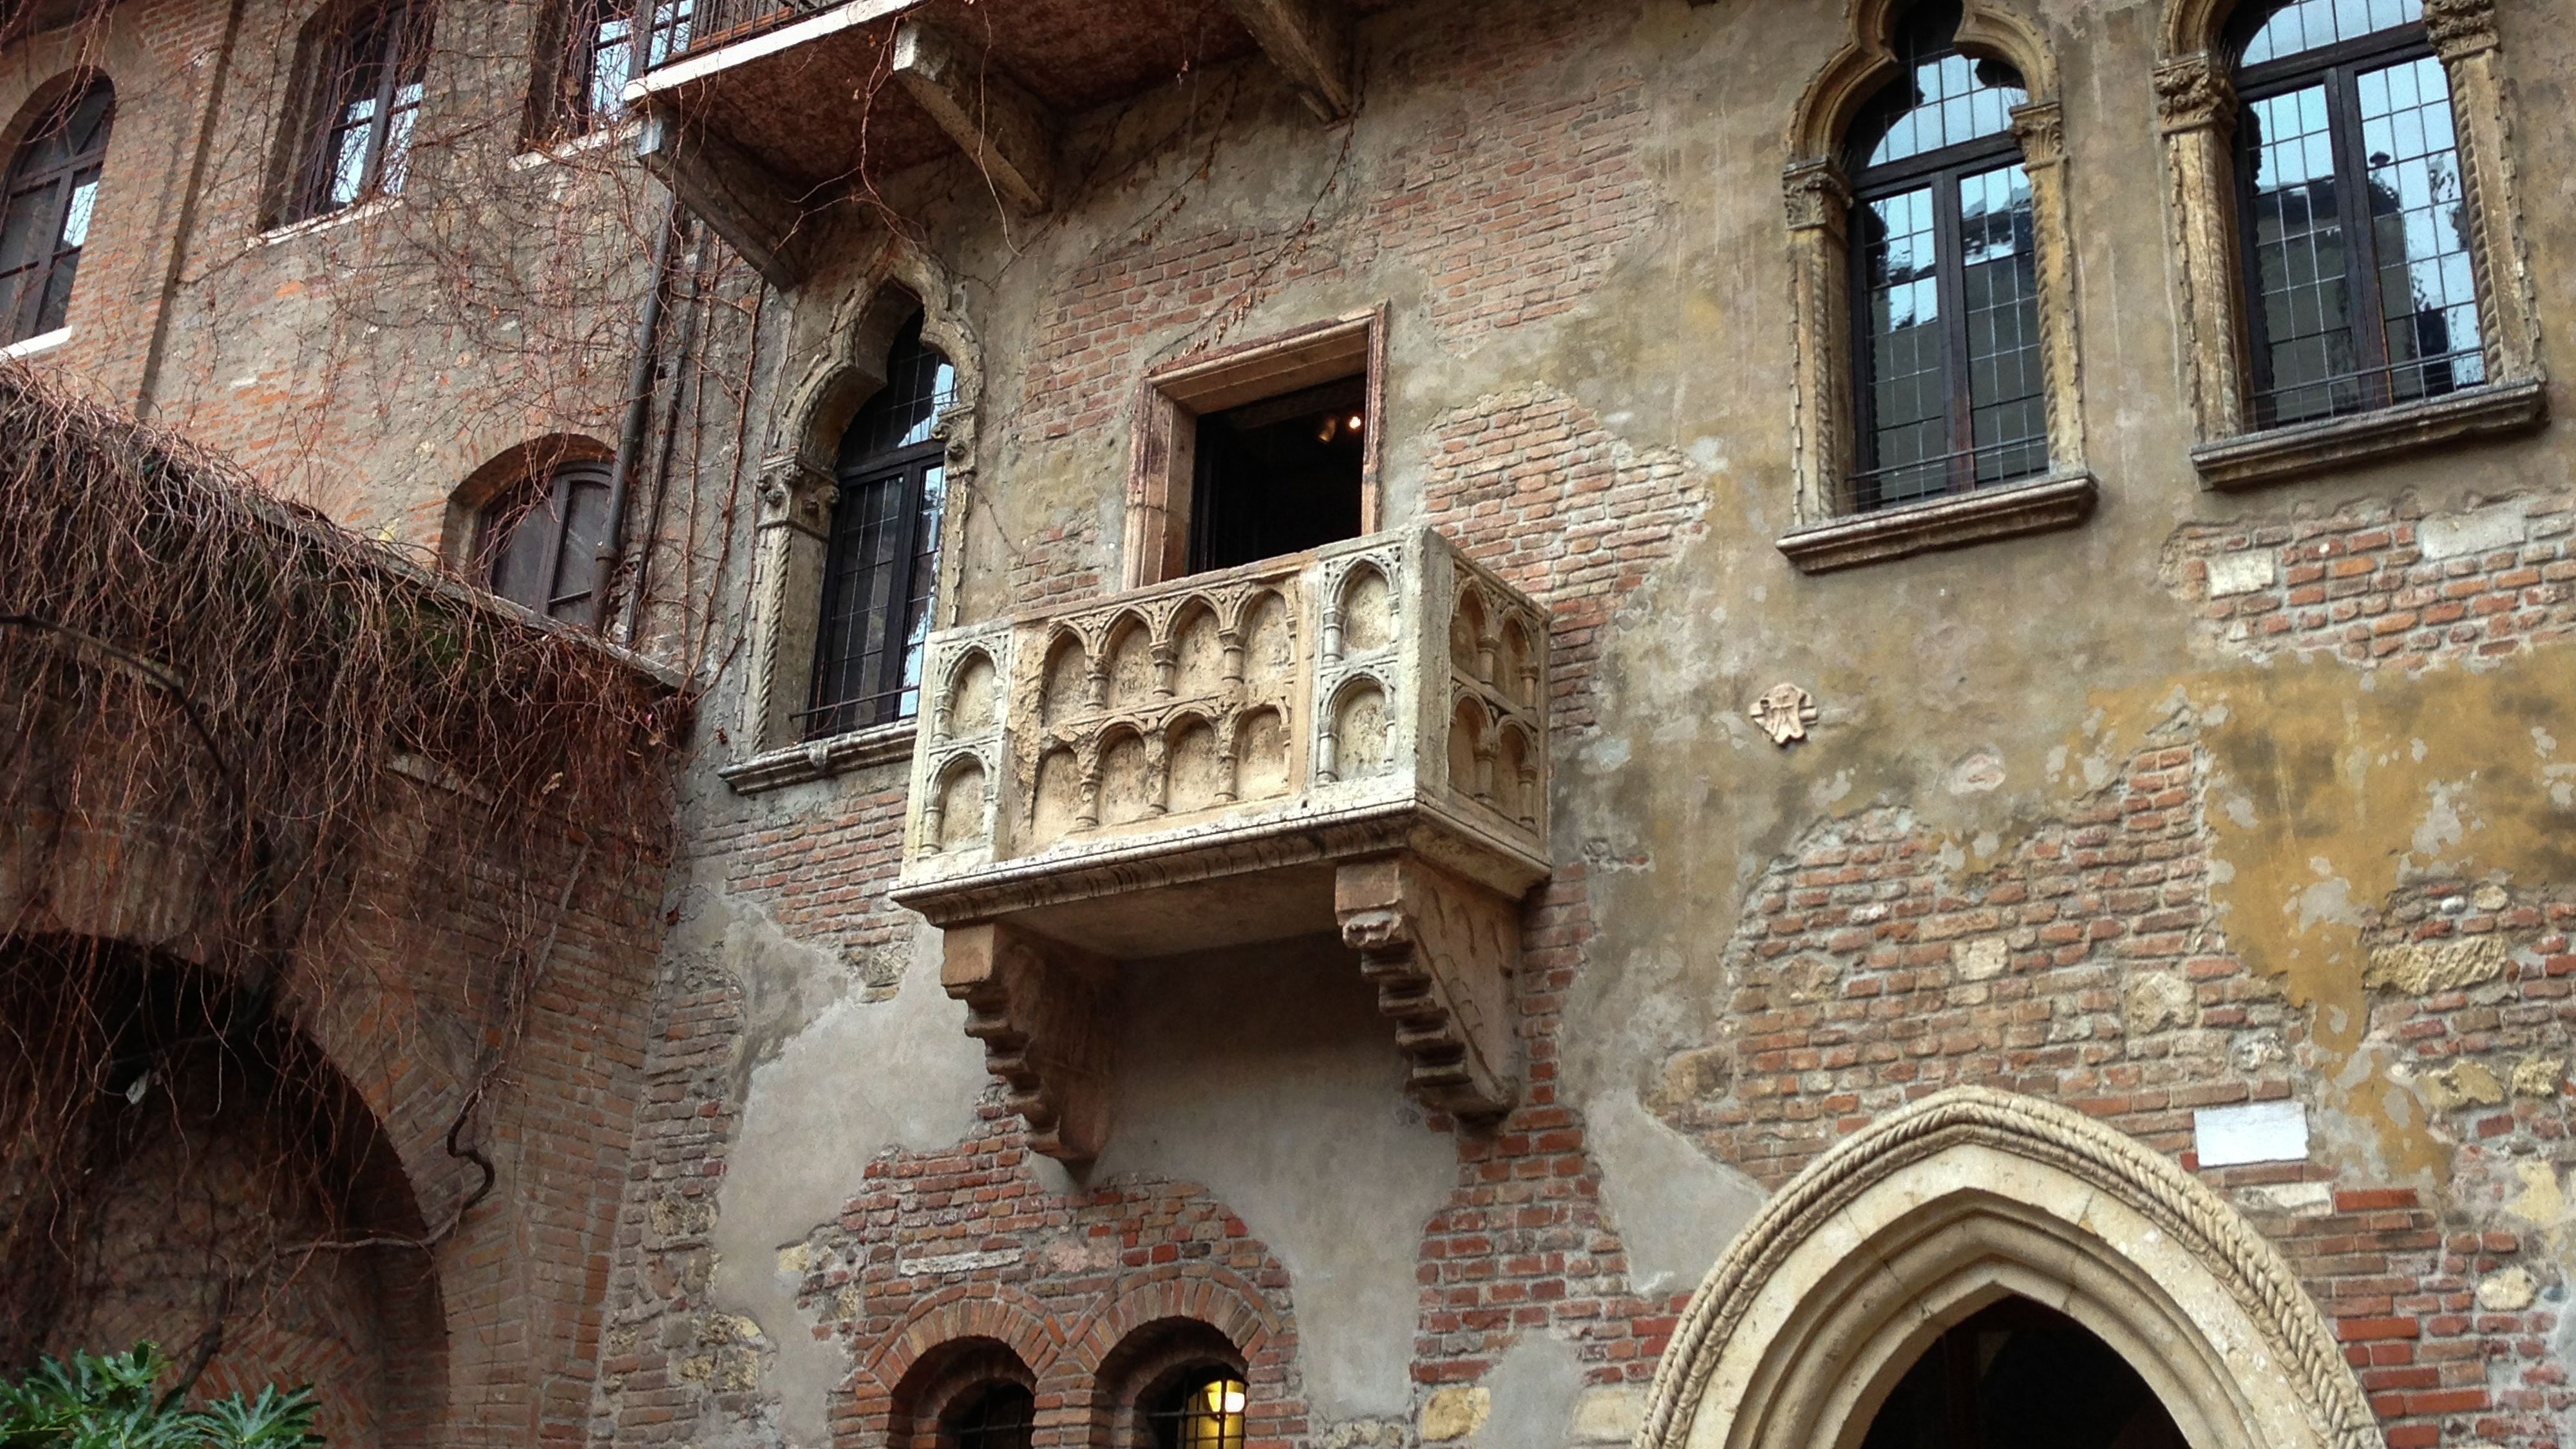 Excerpt From Romeo And Juliet Balcony Scene